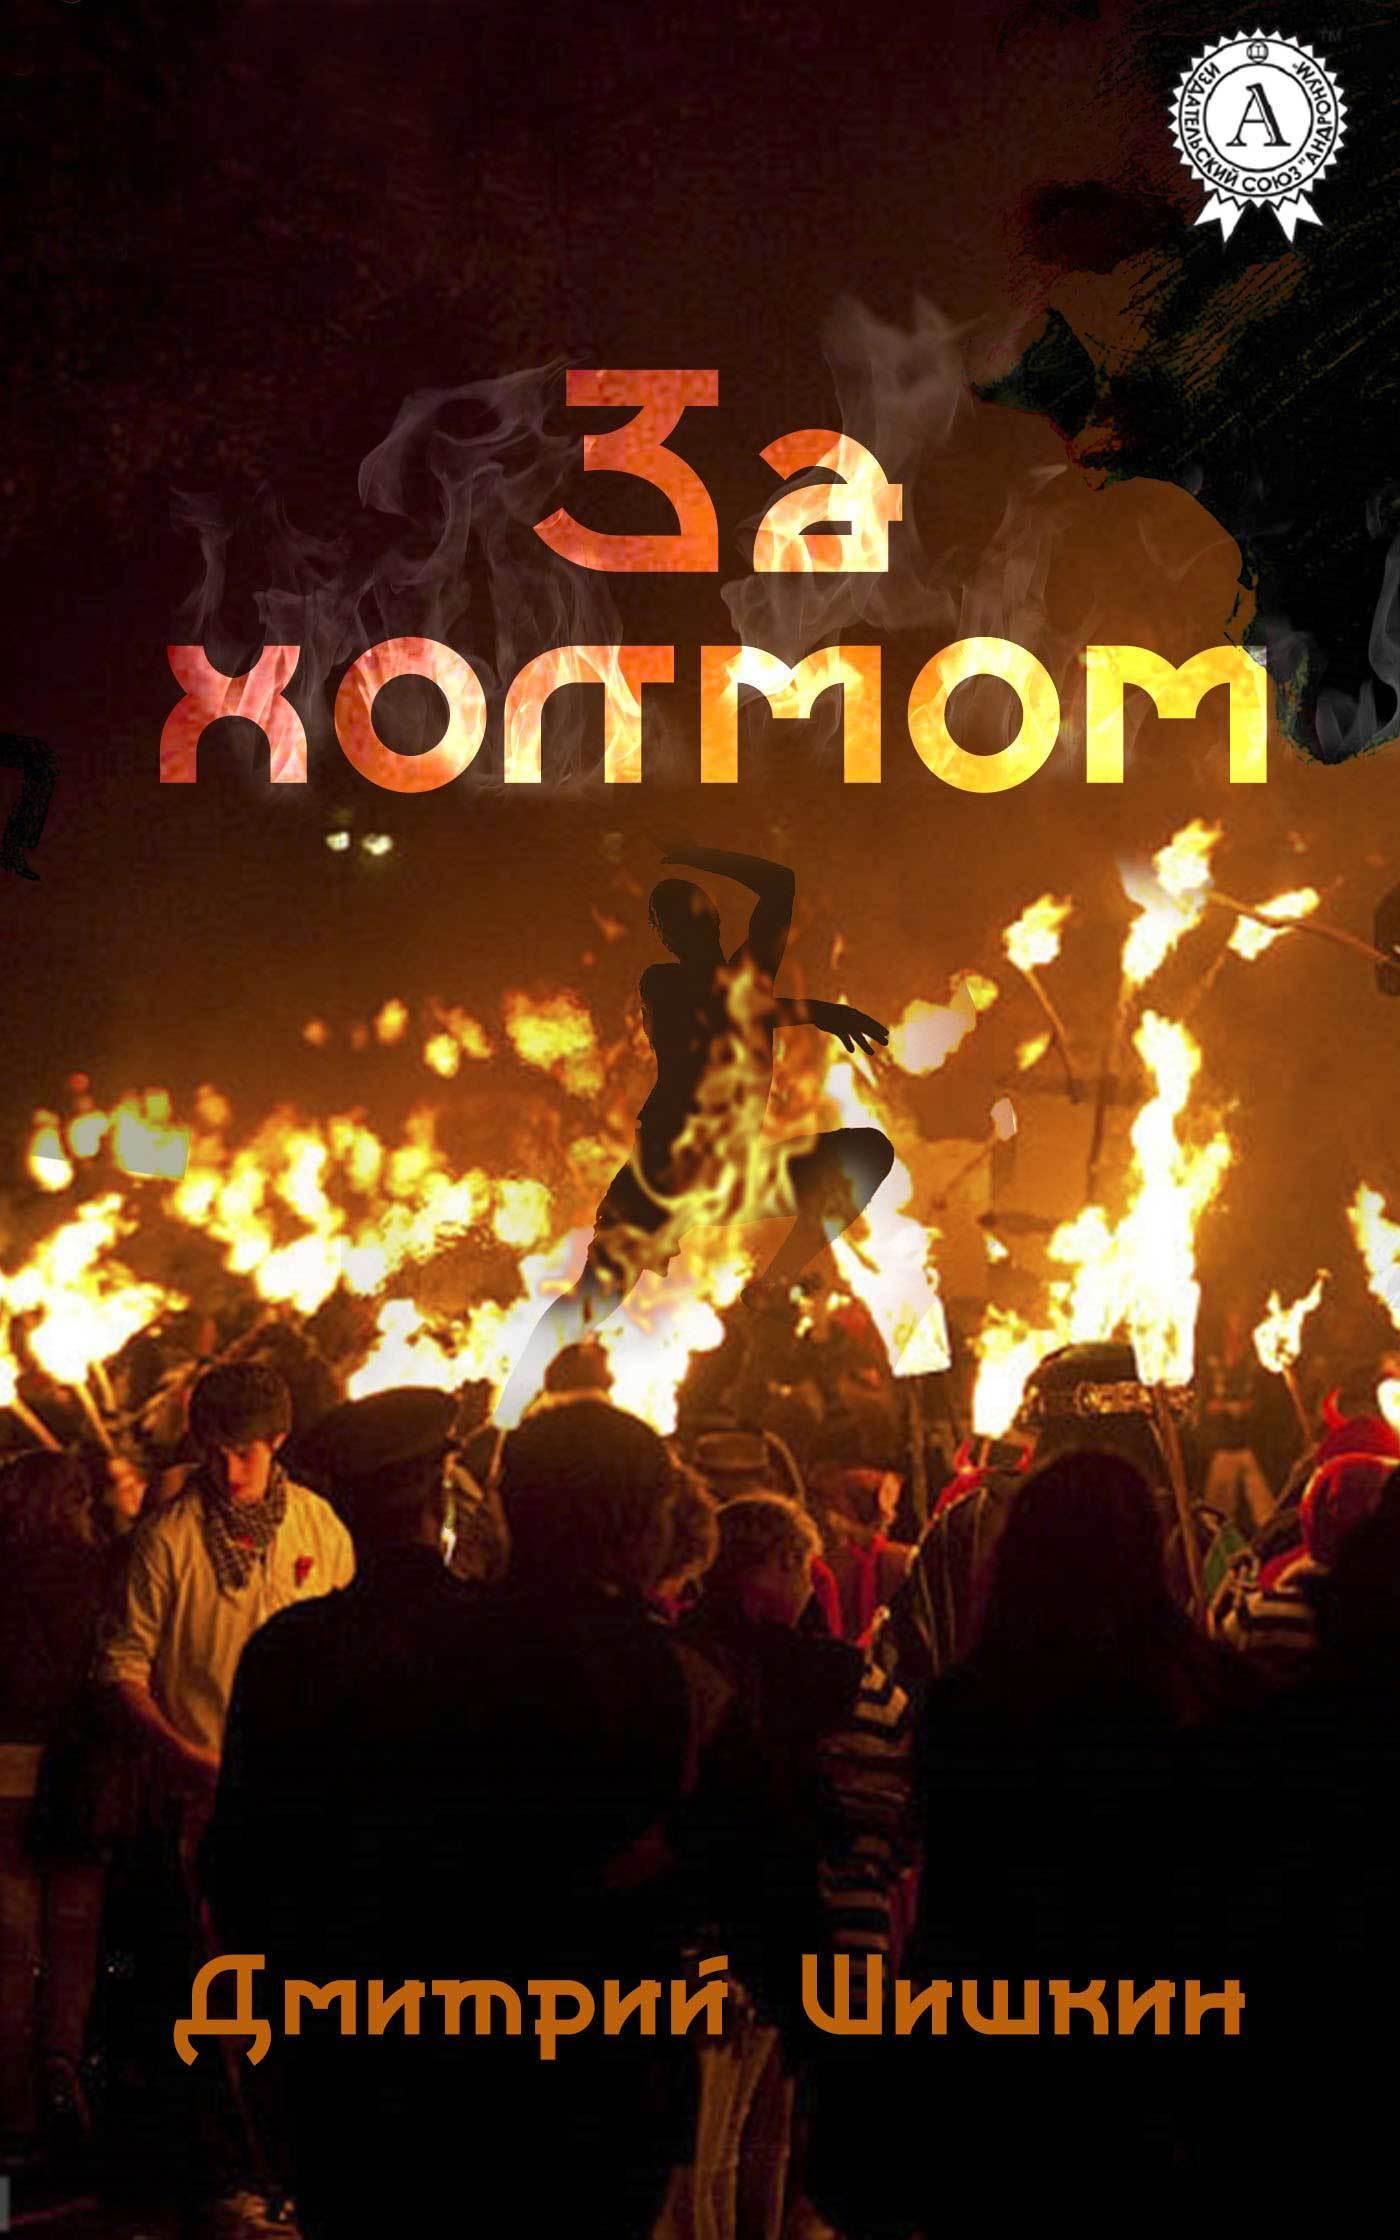 Дмитрий Шишкин - За холмом